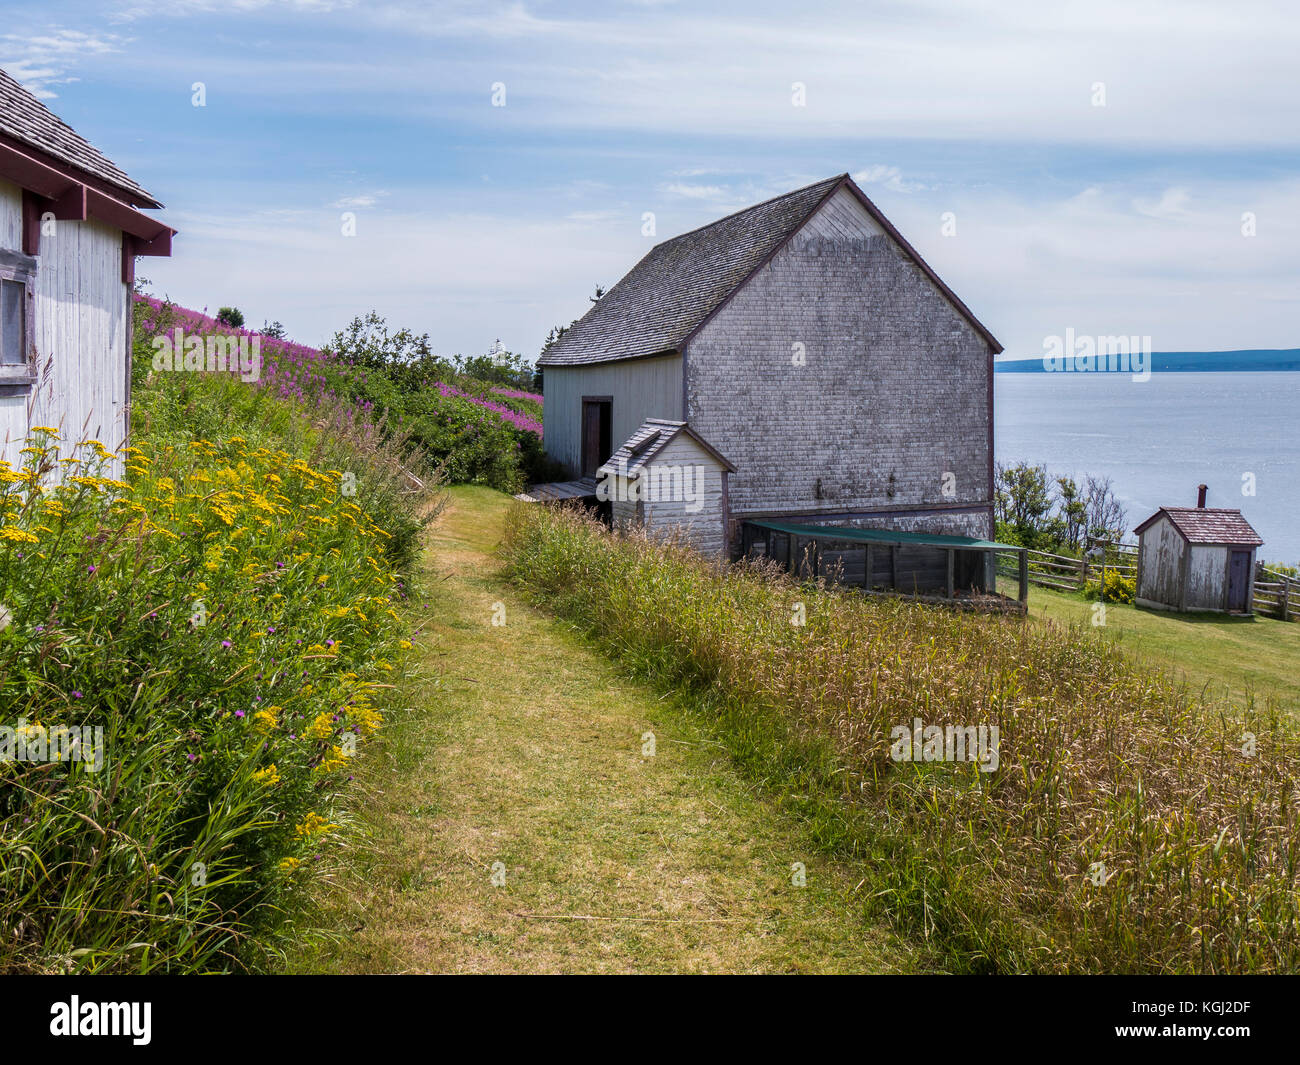 Buildings at L'Anse Blanchette, Forillon National Park, Gaspe Peninsula, Canada. - Stock Image